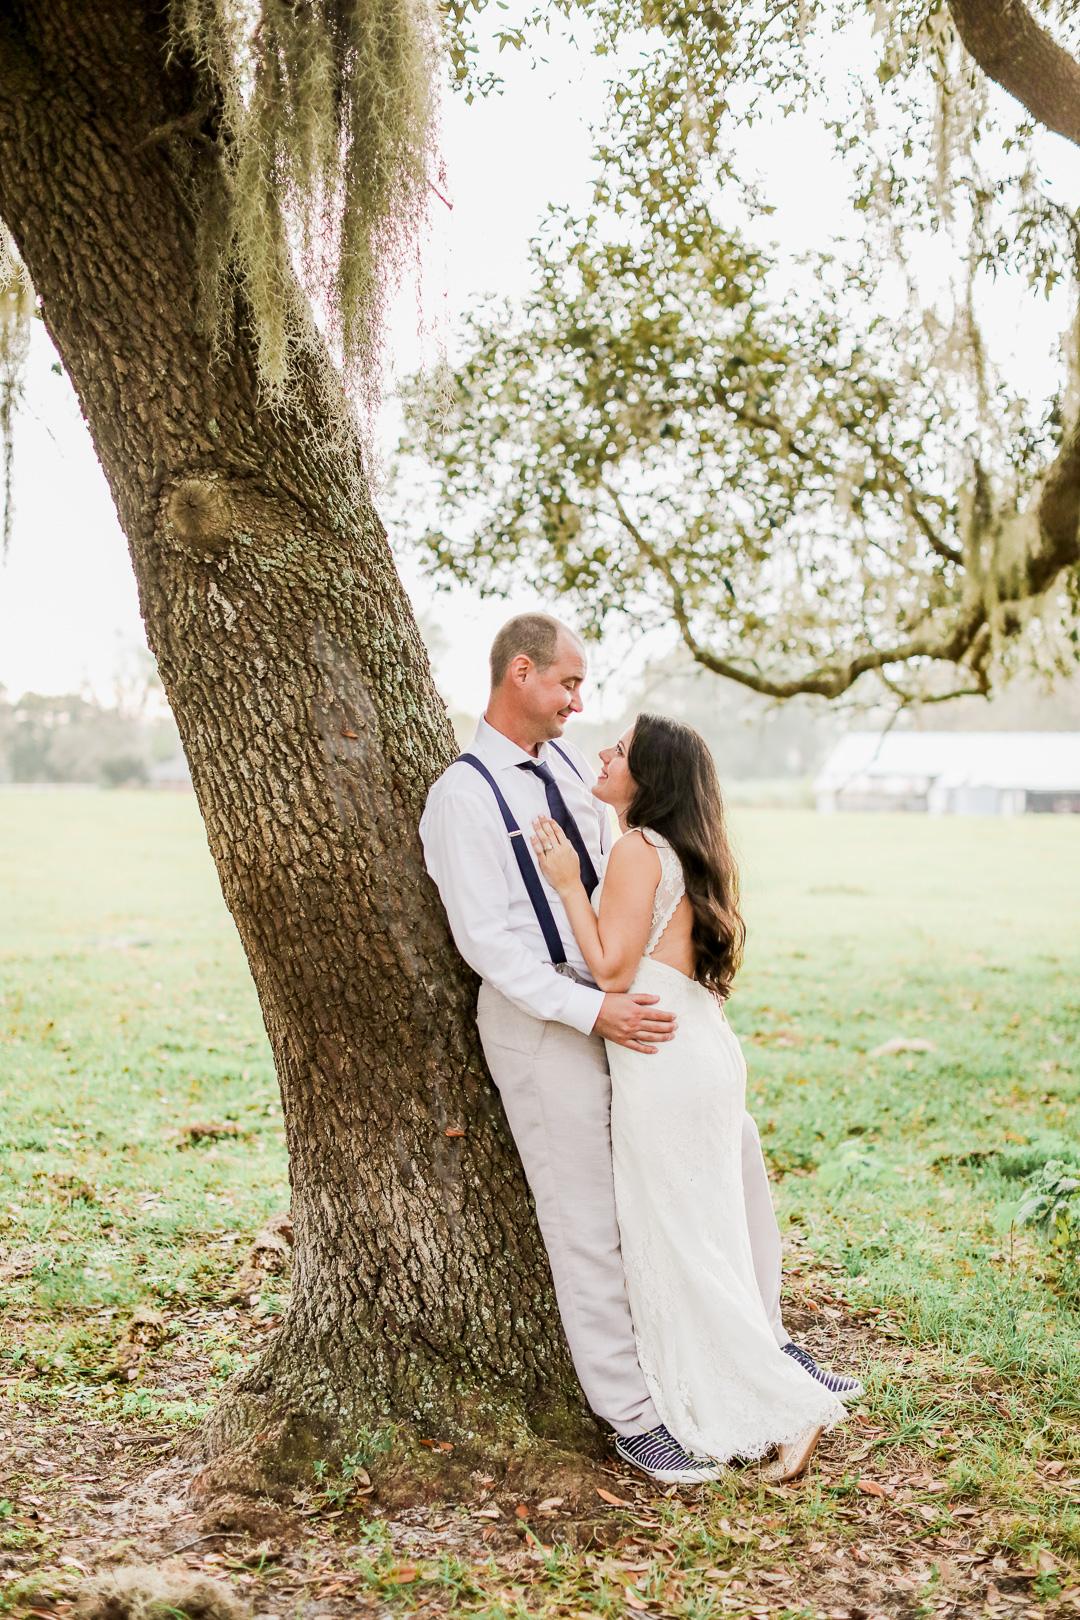 williams_family_newlywed-133.jpg